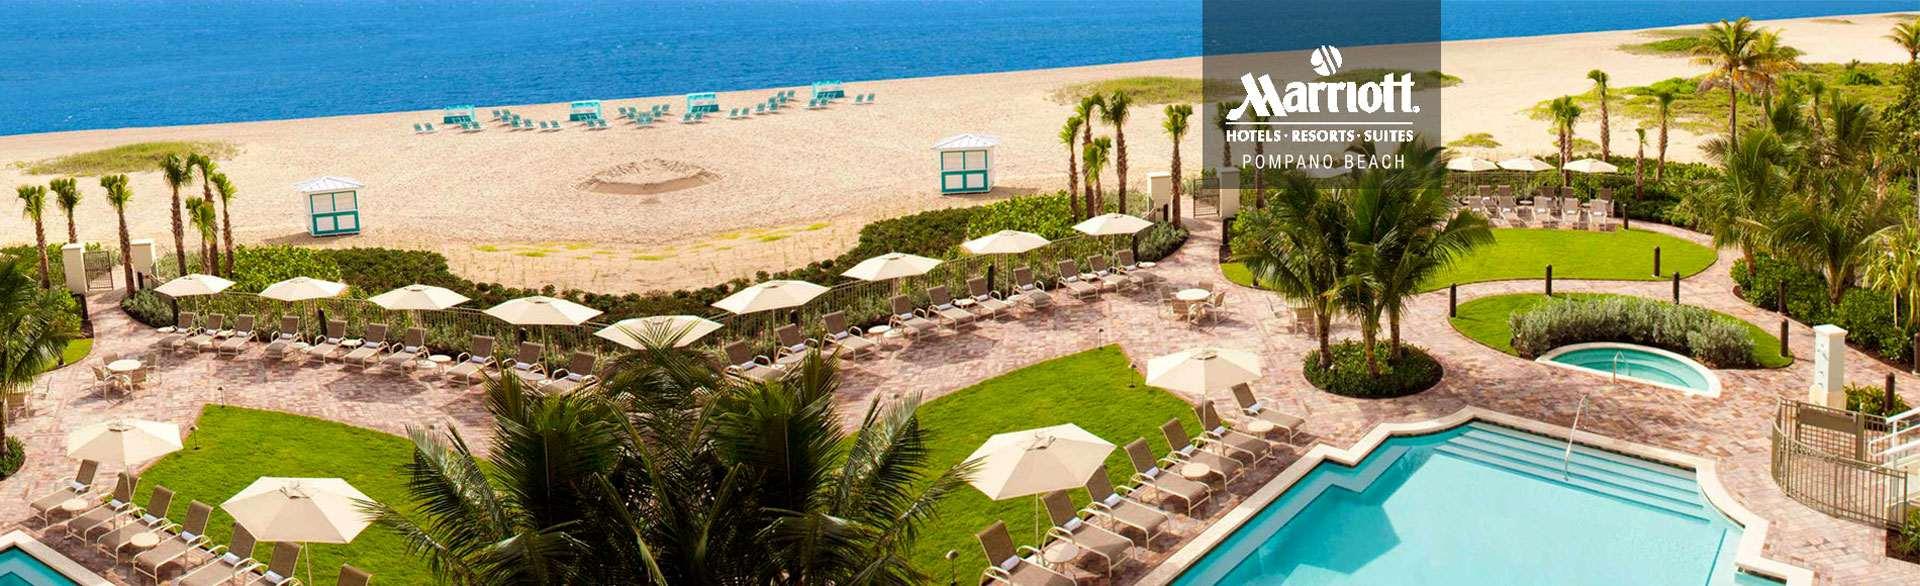 Fort Lauderdale Marriott Pompano Beach Resort Spa Pompano Beach